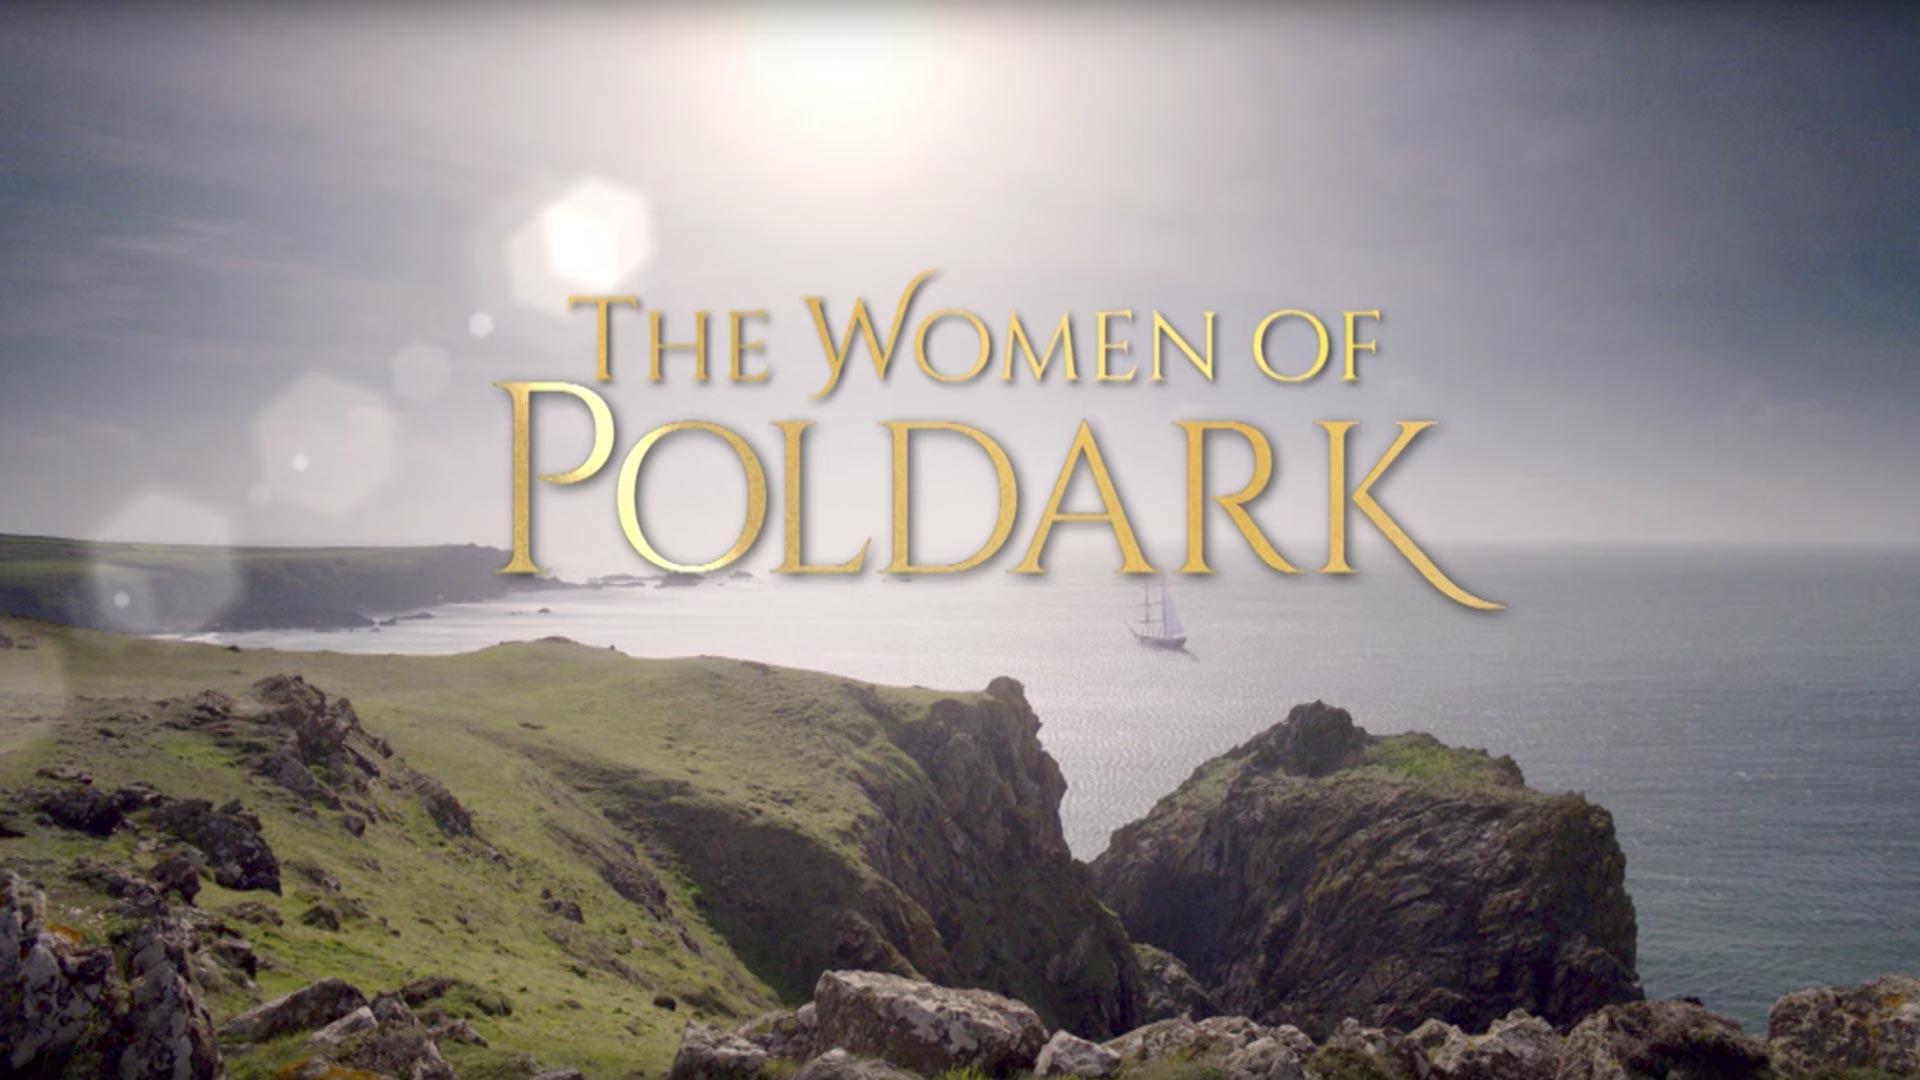 The Women of Poldark